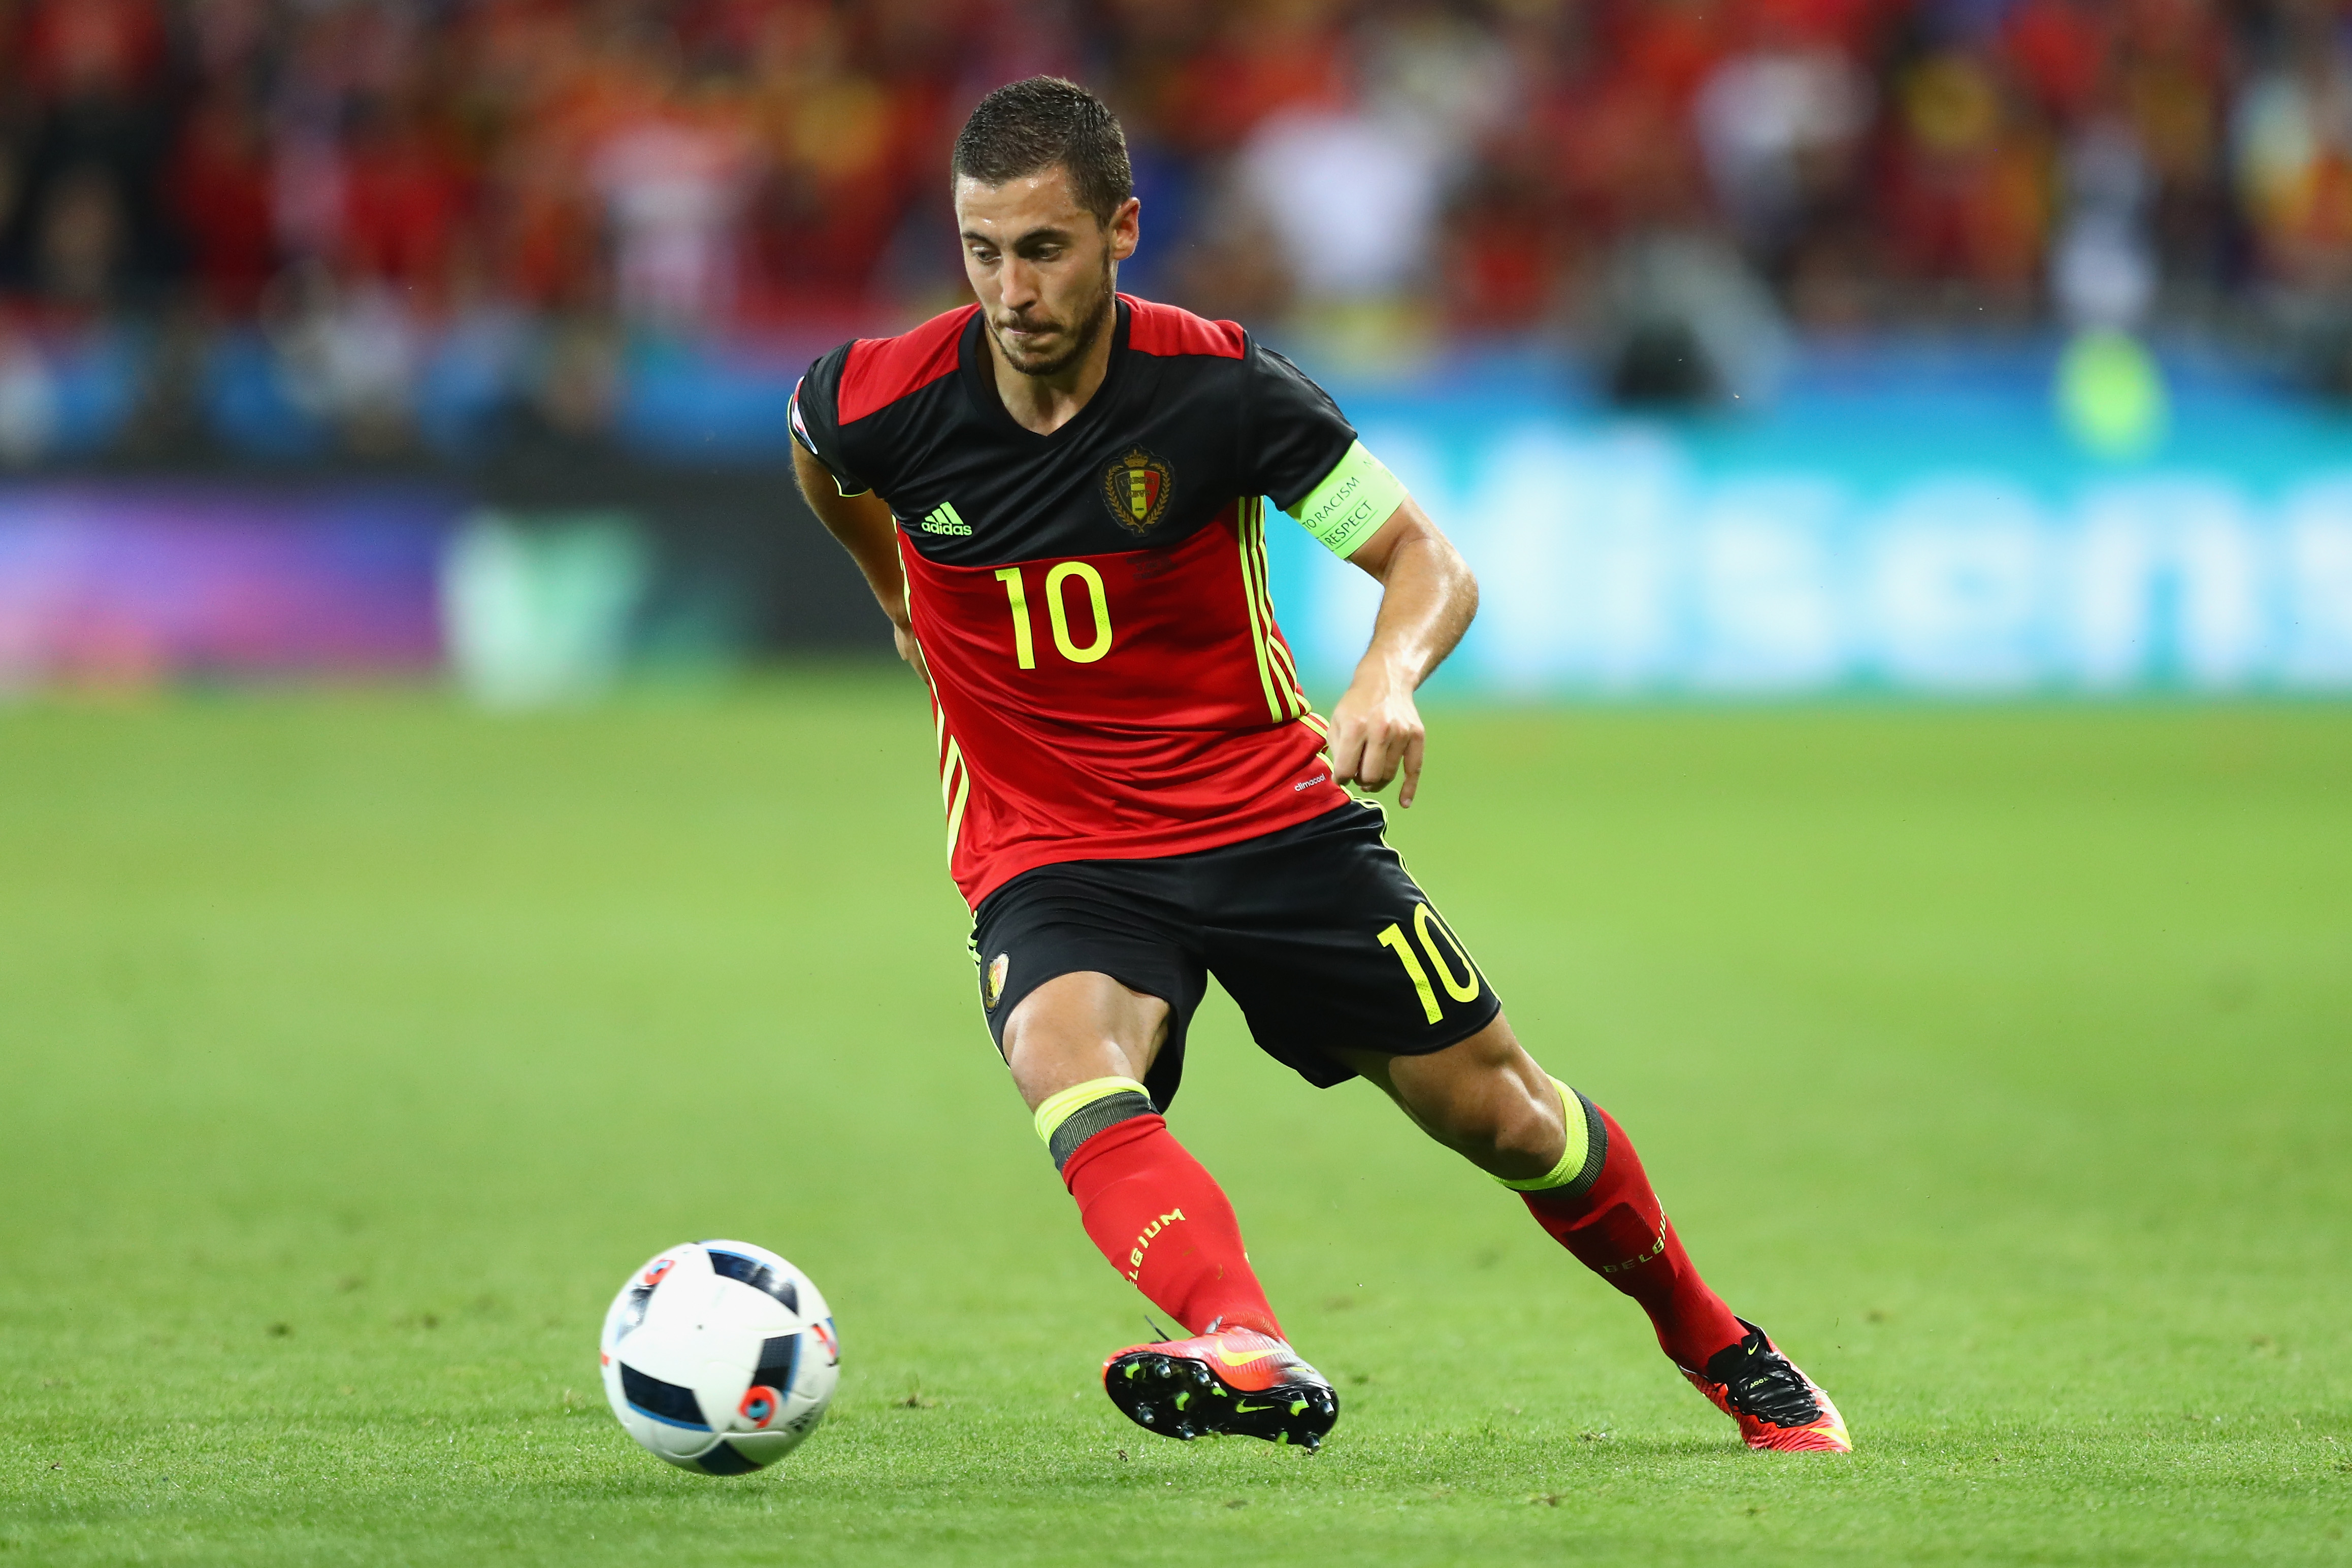 'I won't copy John Terry's leadership style at Chelsea,' says Belgium captain Eden Hazard